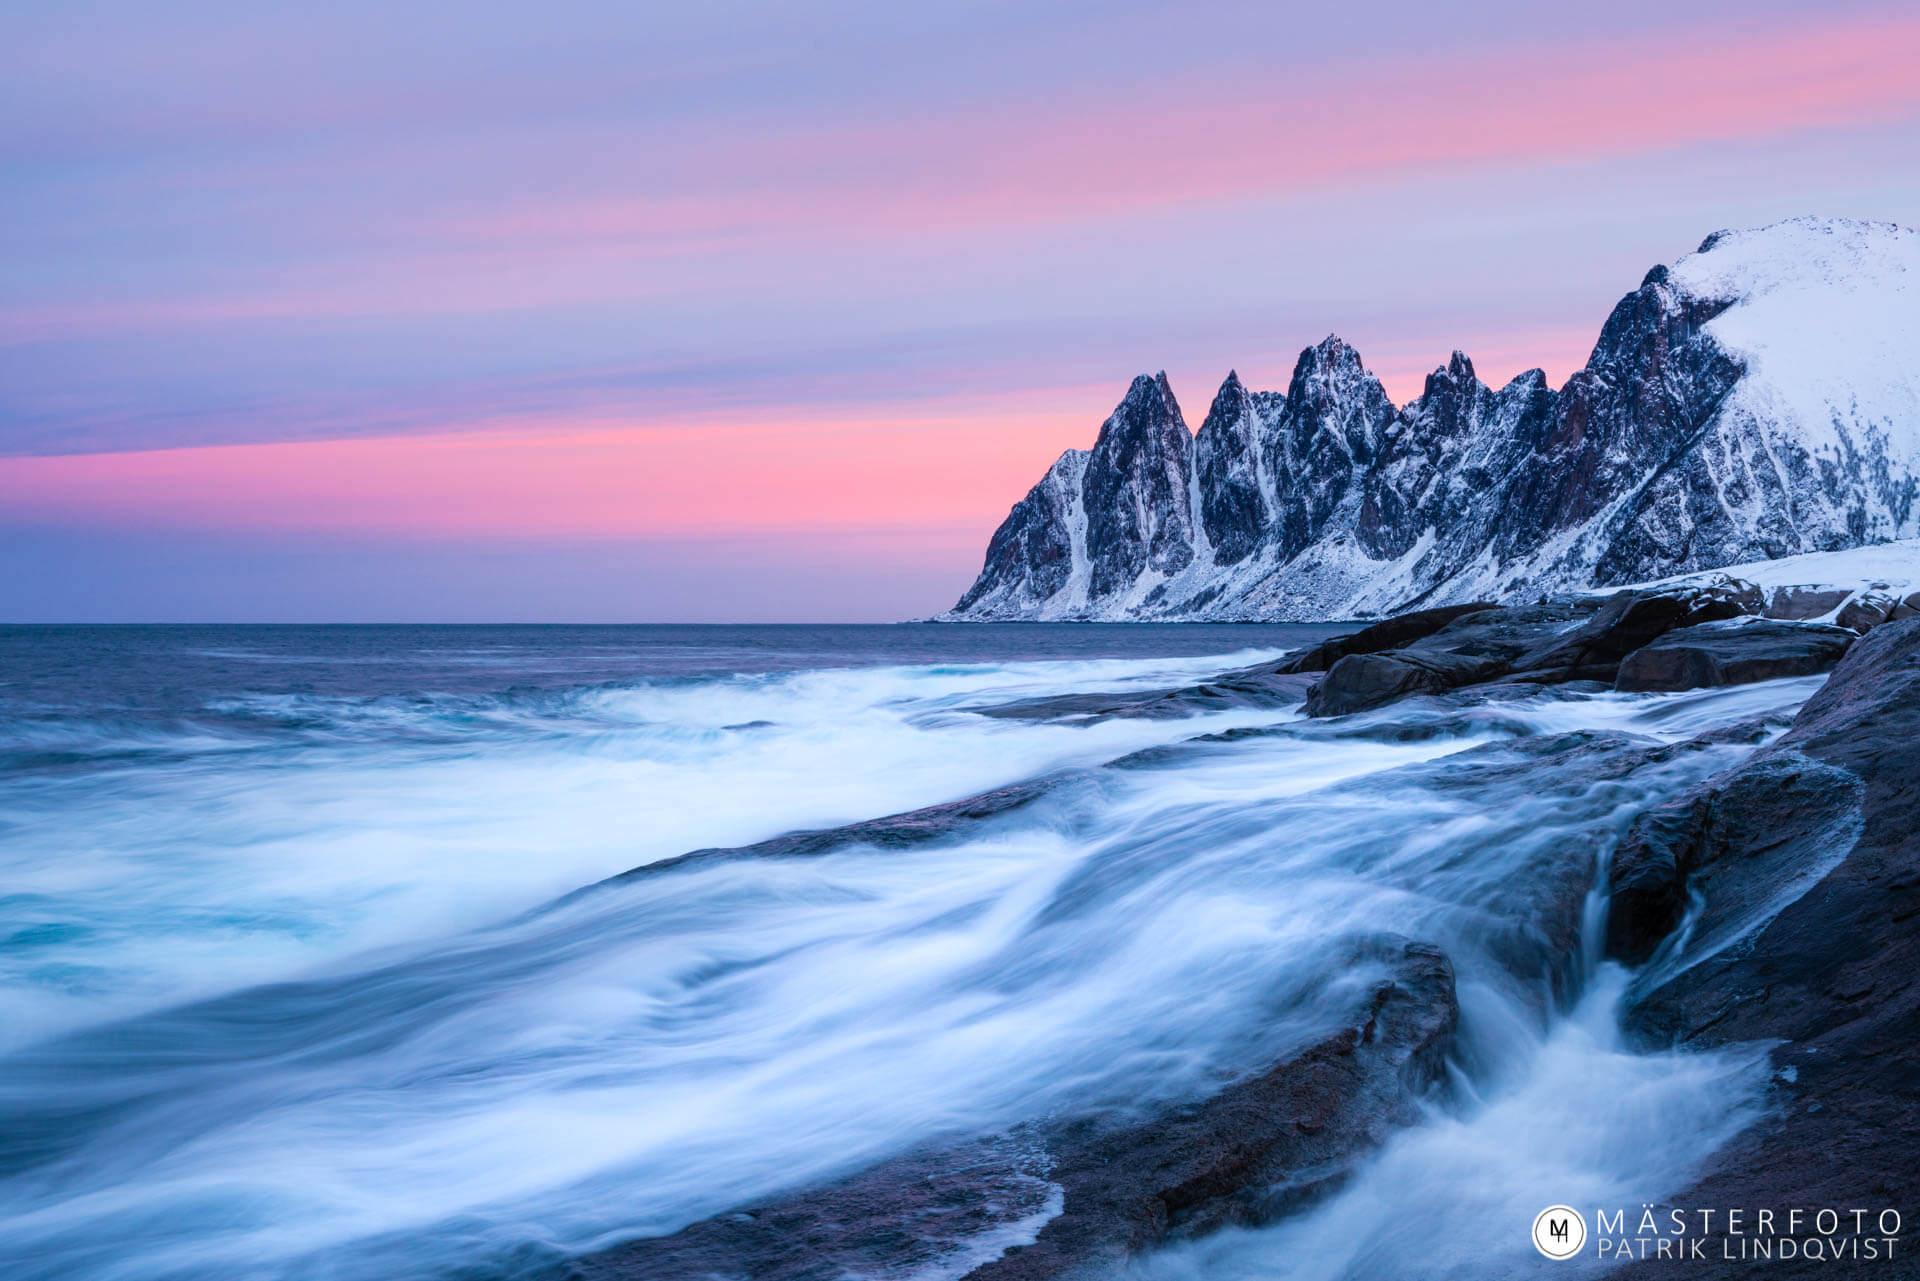 Fotoresor till Senja Norge. Workshop i kustlandskap